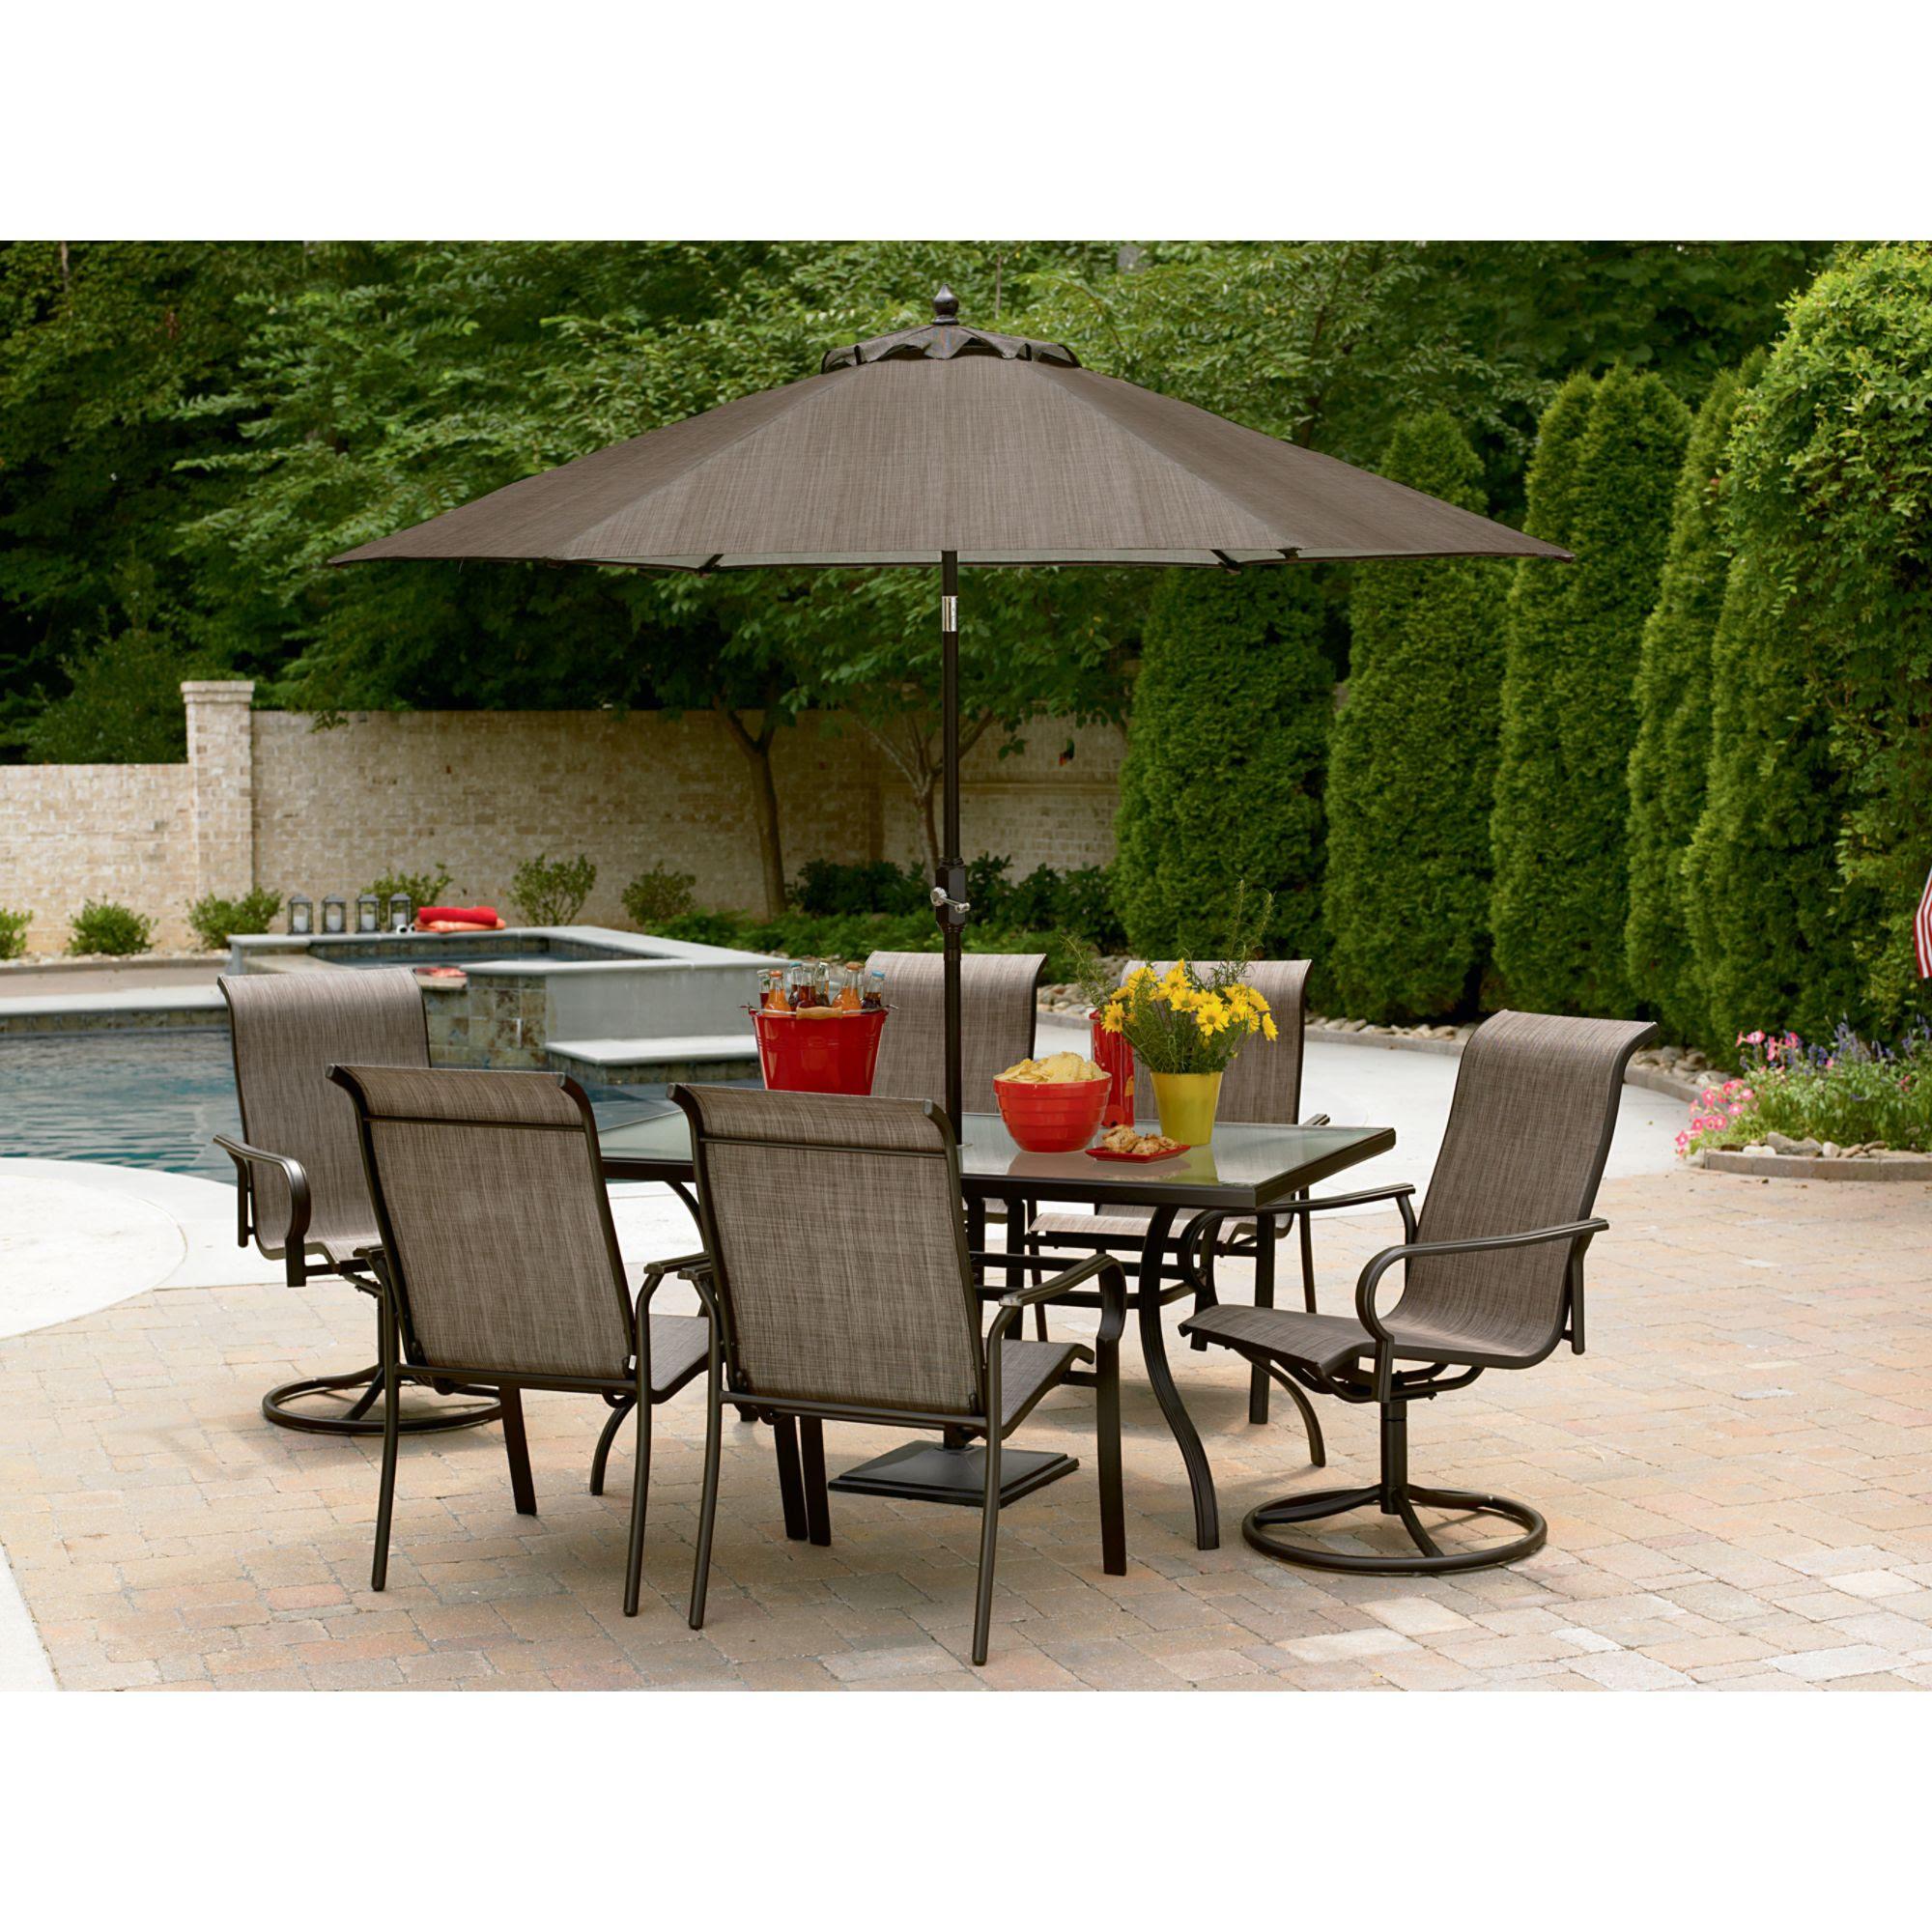 Garden Oasis Patio Furniture Contact Info - patio furniture